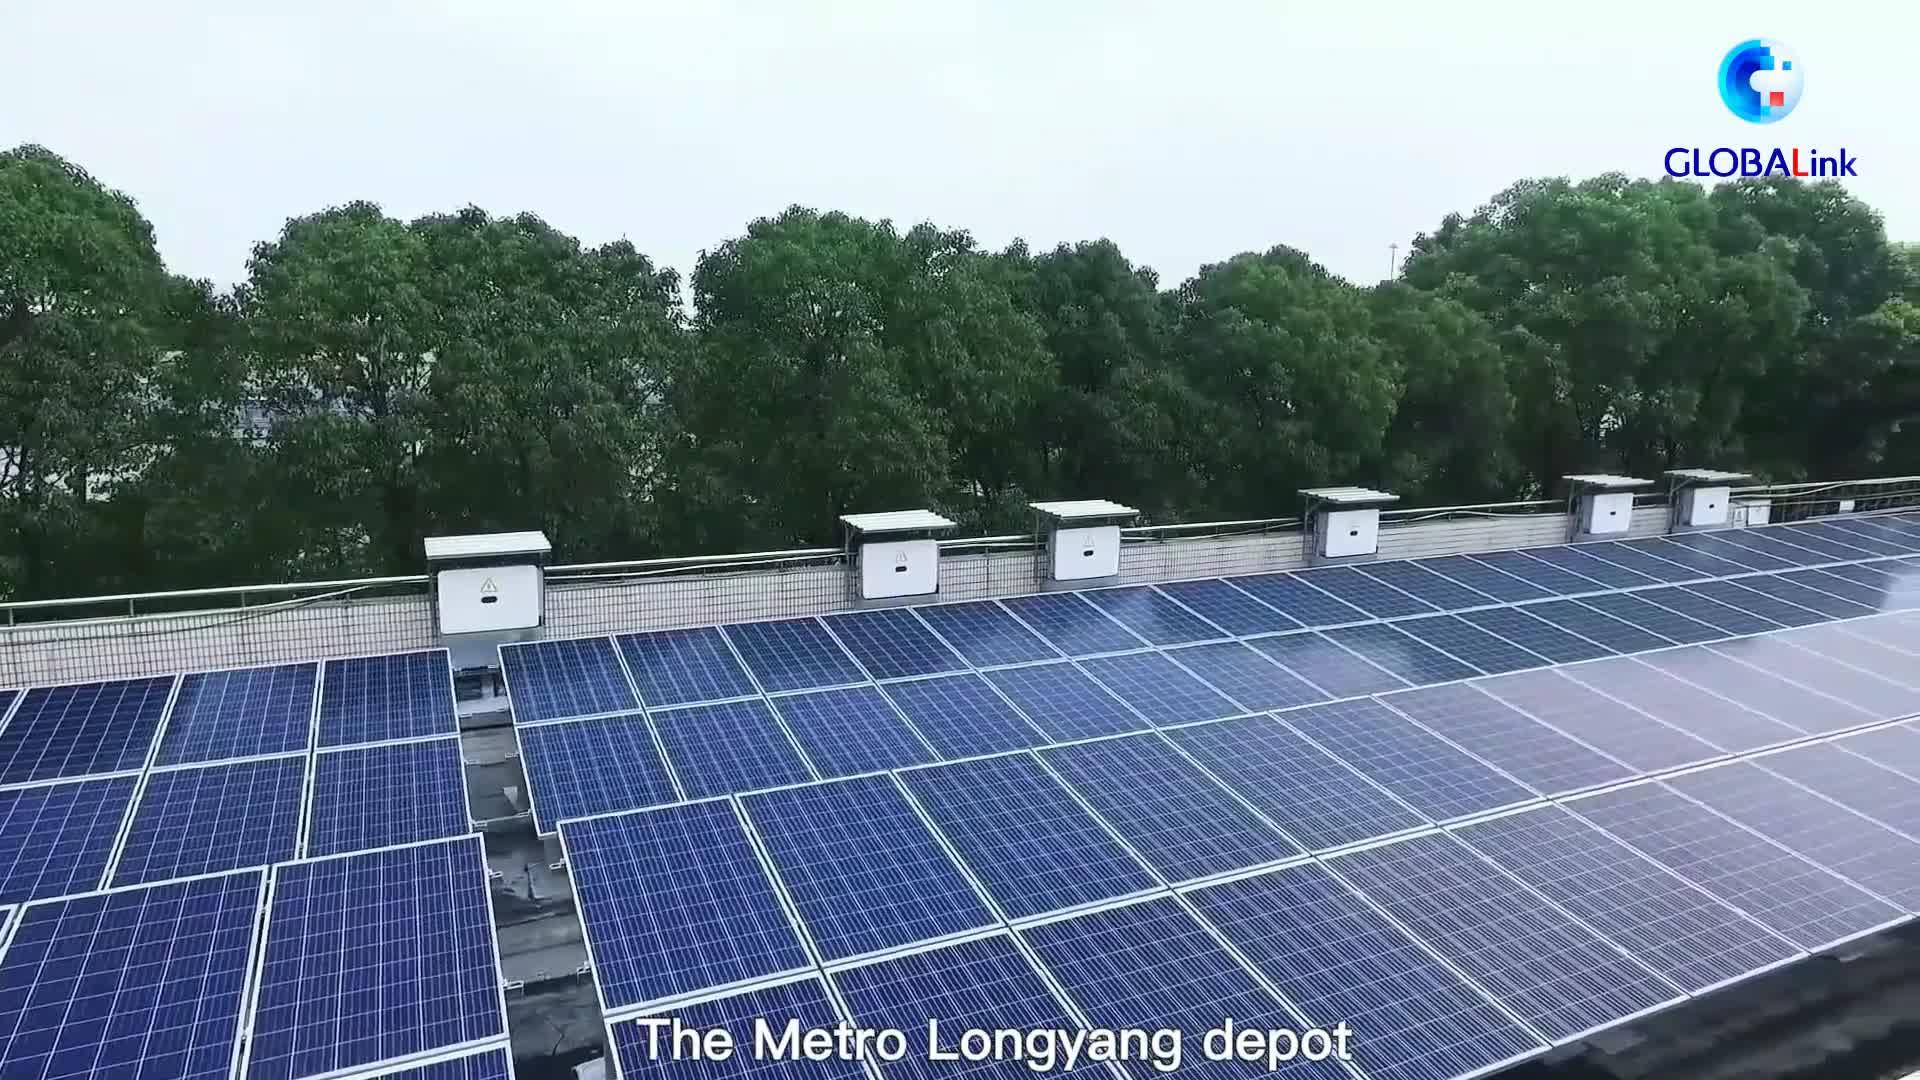 GLOBALink | Metro depot turns into solar power station in Shanghai